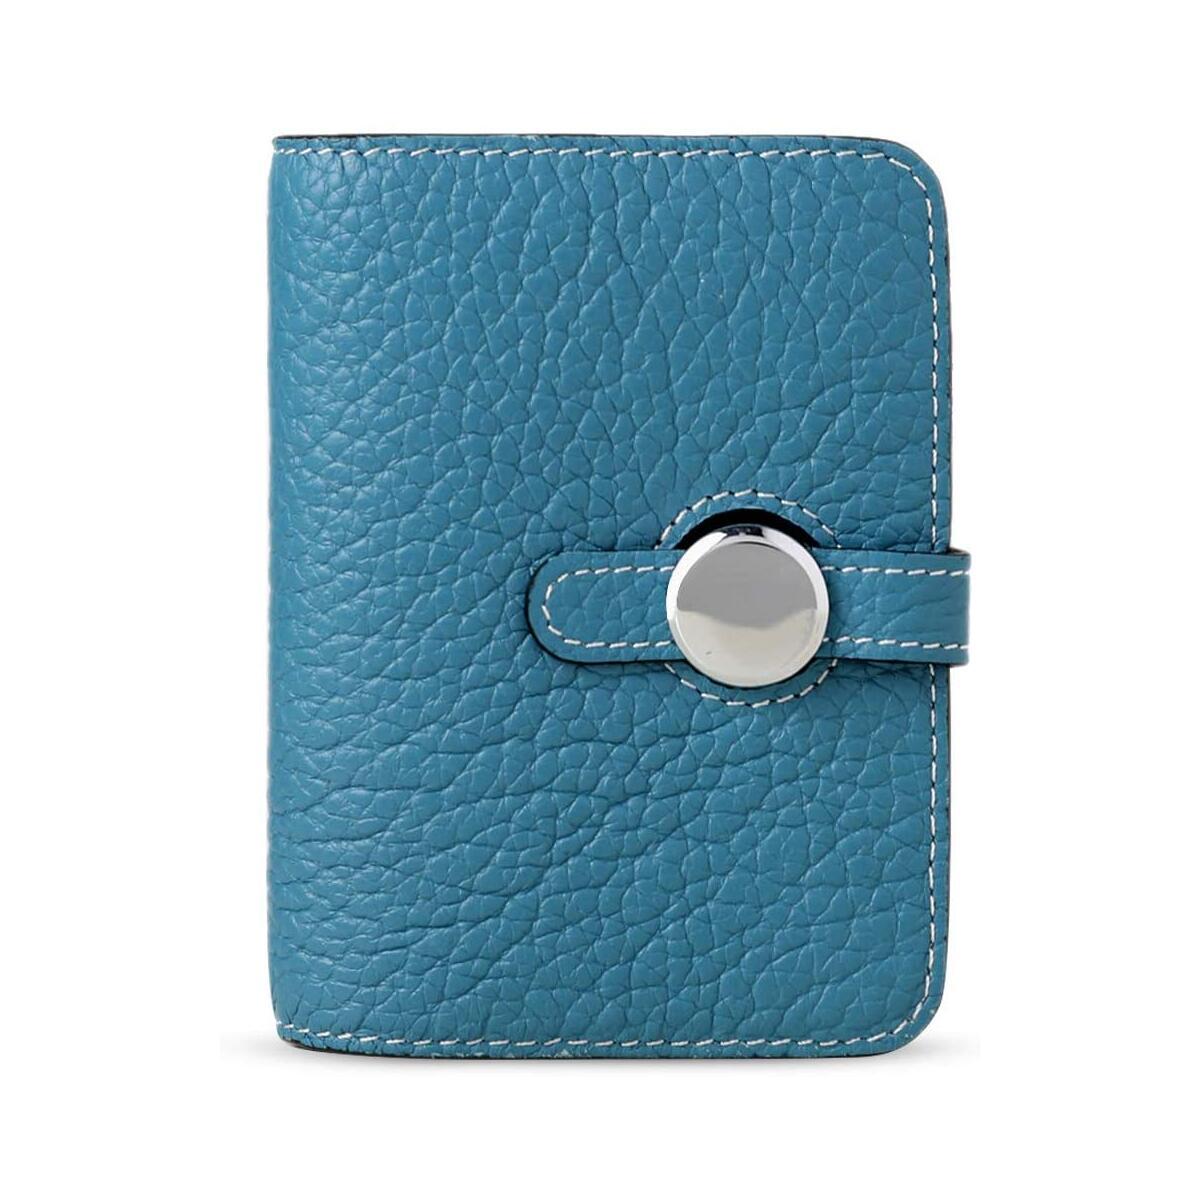 HanZu Small Leather Wallet for Women RFID Blocking Credit Card Holder Mini Bifold Pocket Purse